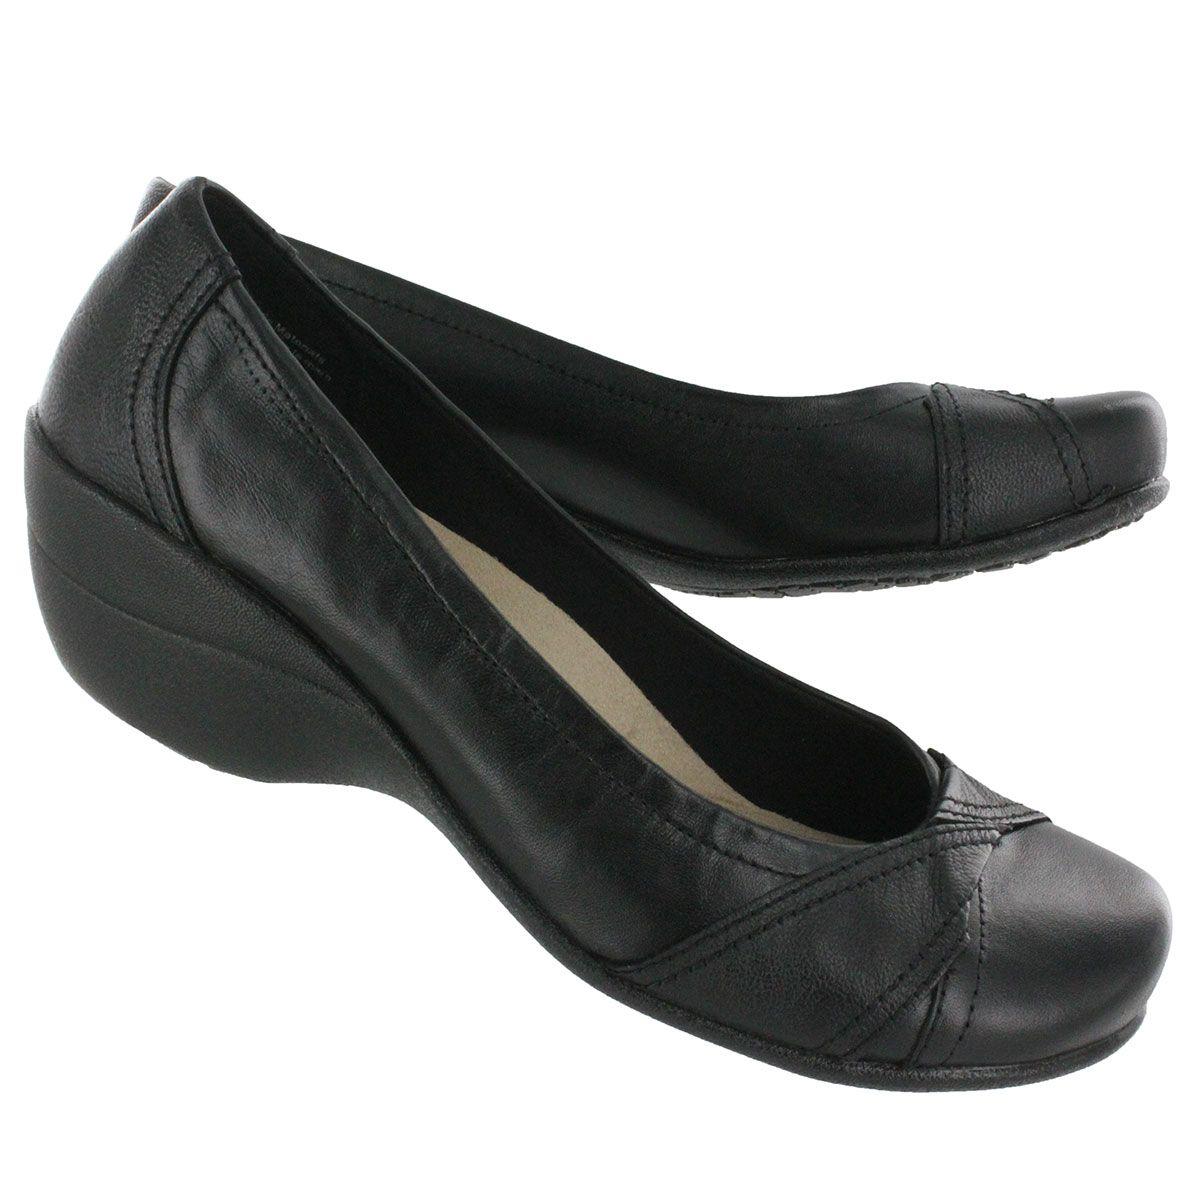 Women's KANA black slip on wedge pumps